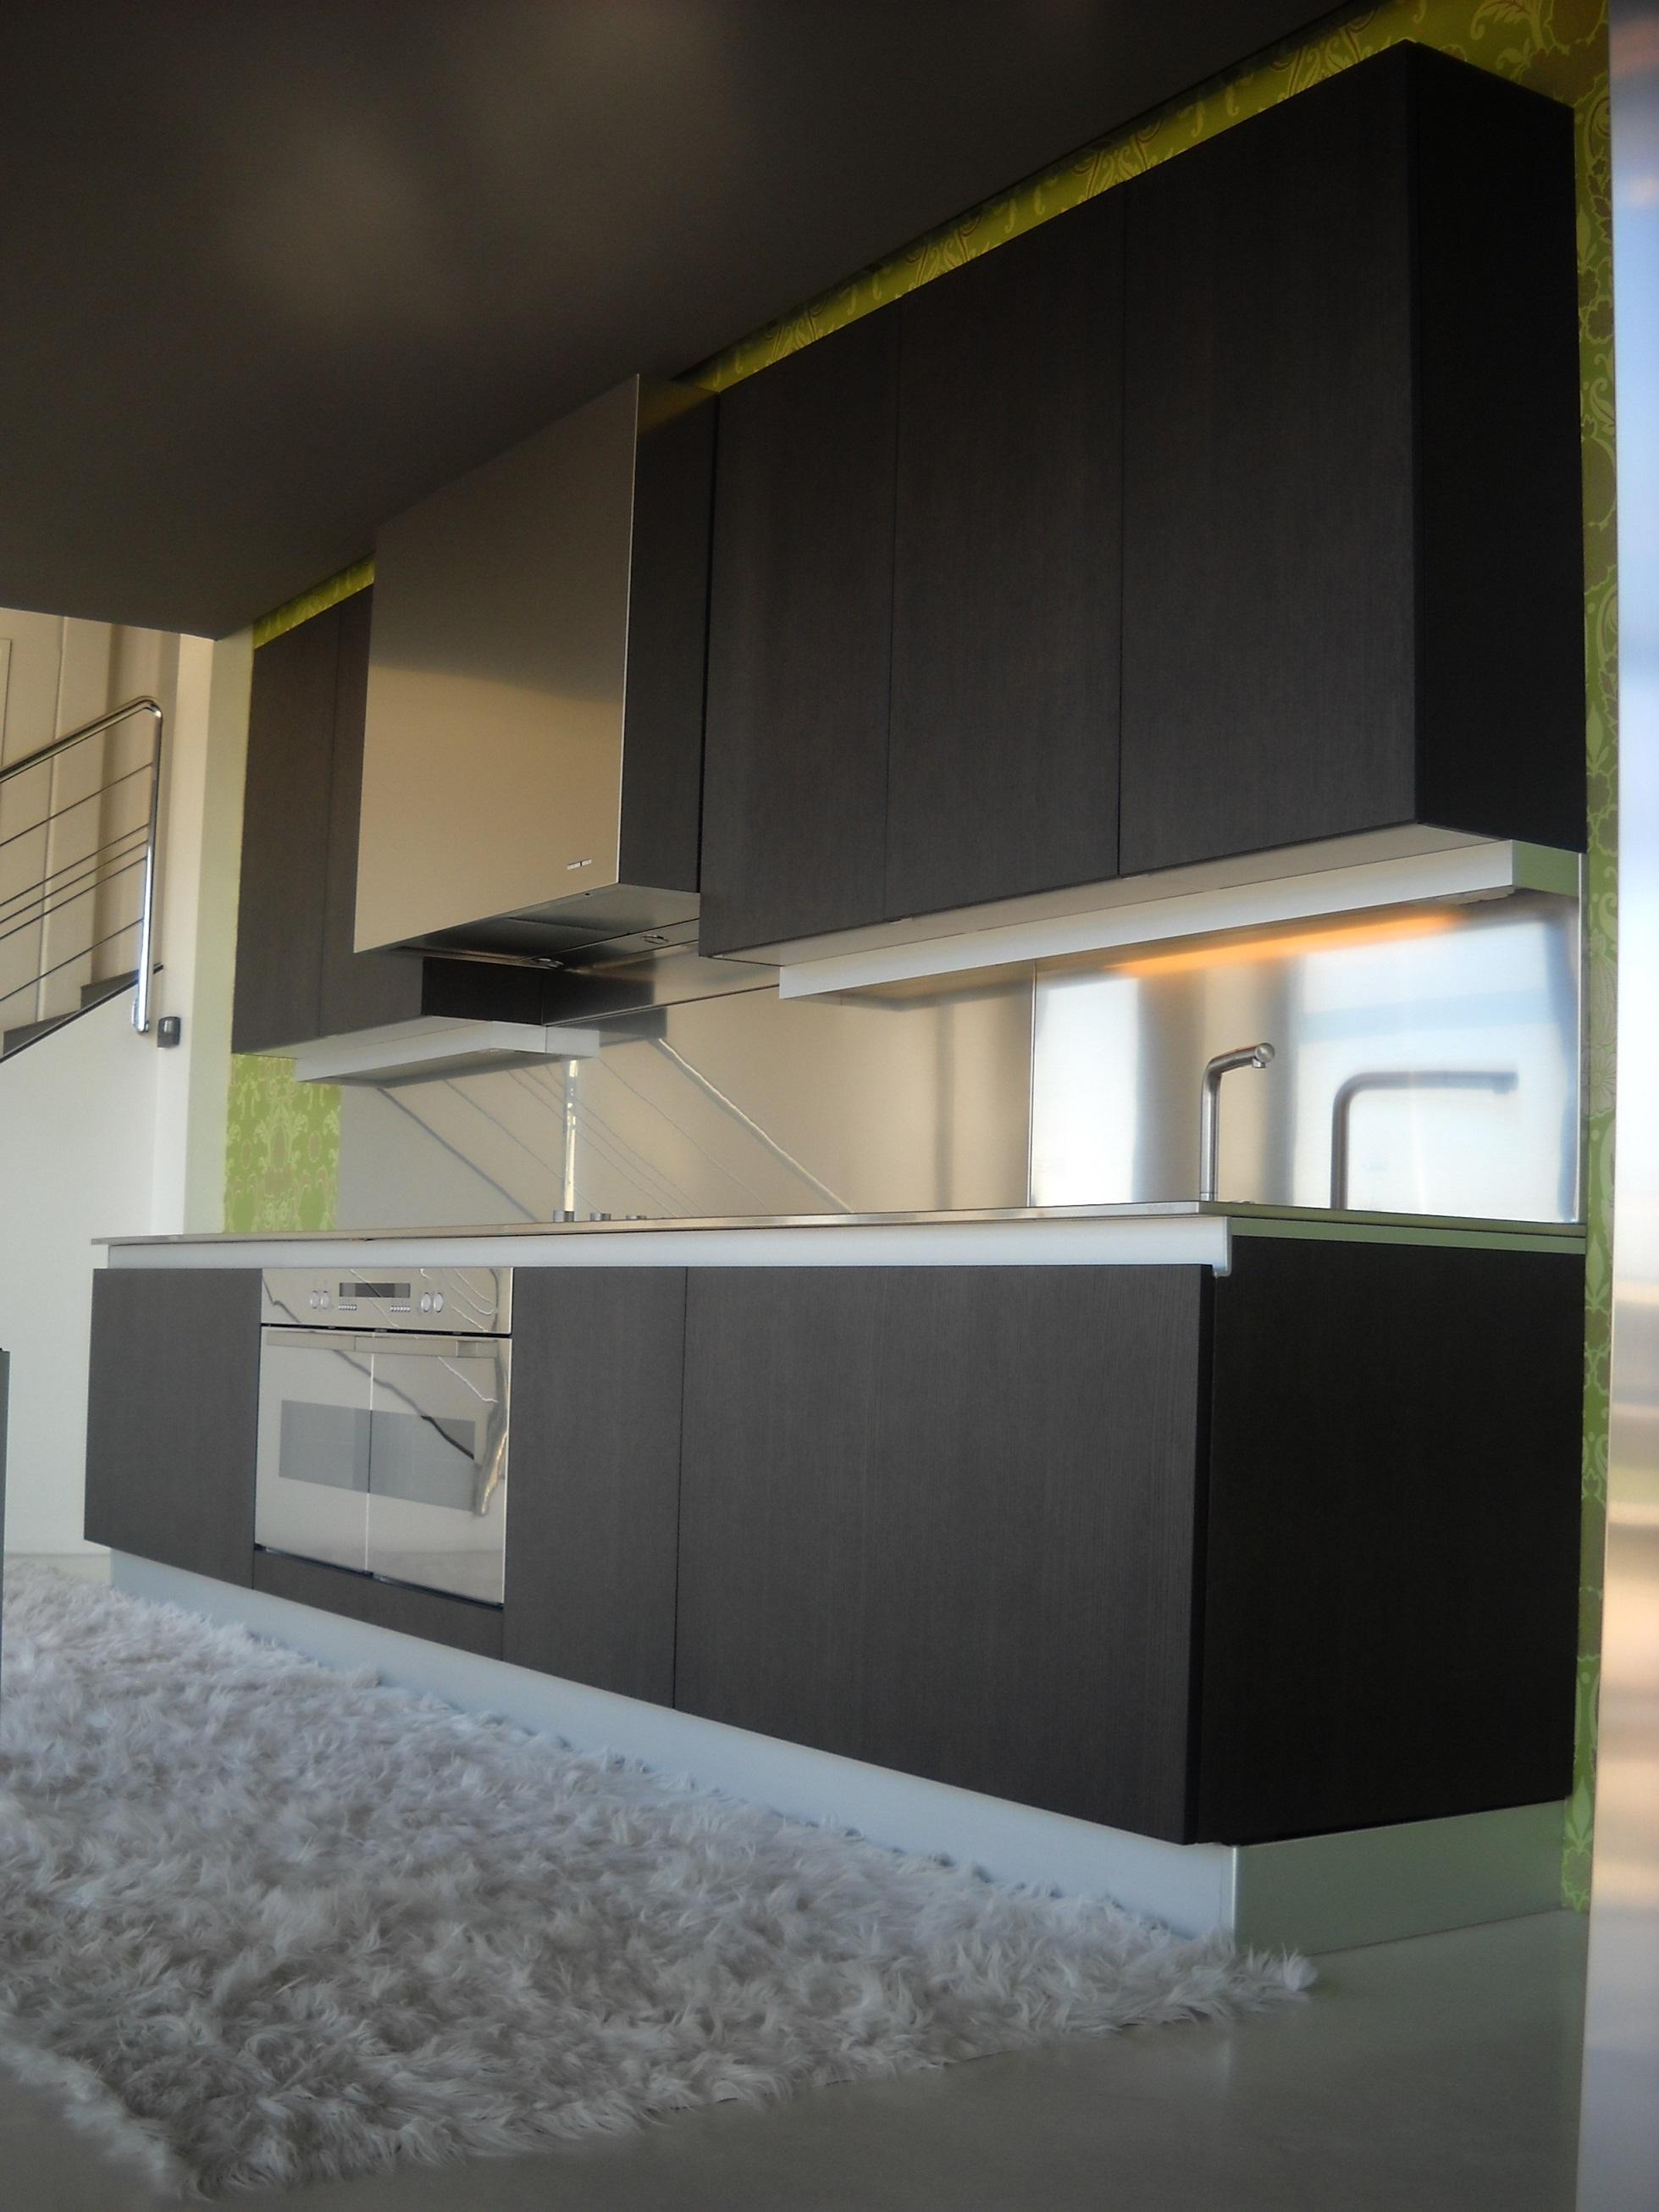 Cucina moderna binova continua w in legno rovere moro cucine a prezzi scontati - Cucina moderna in legno ...